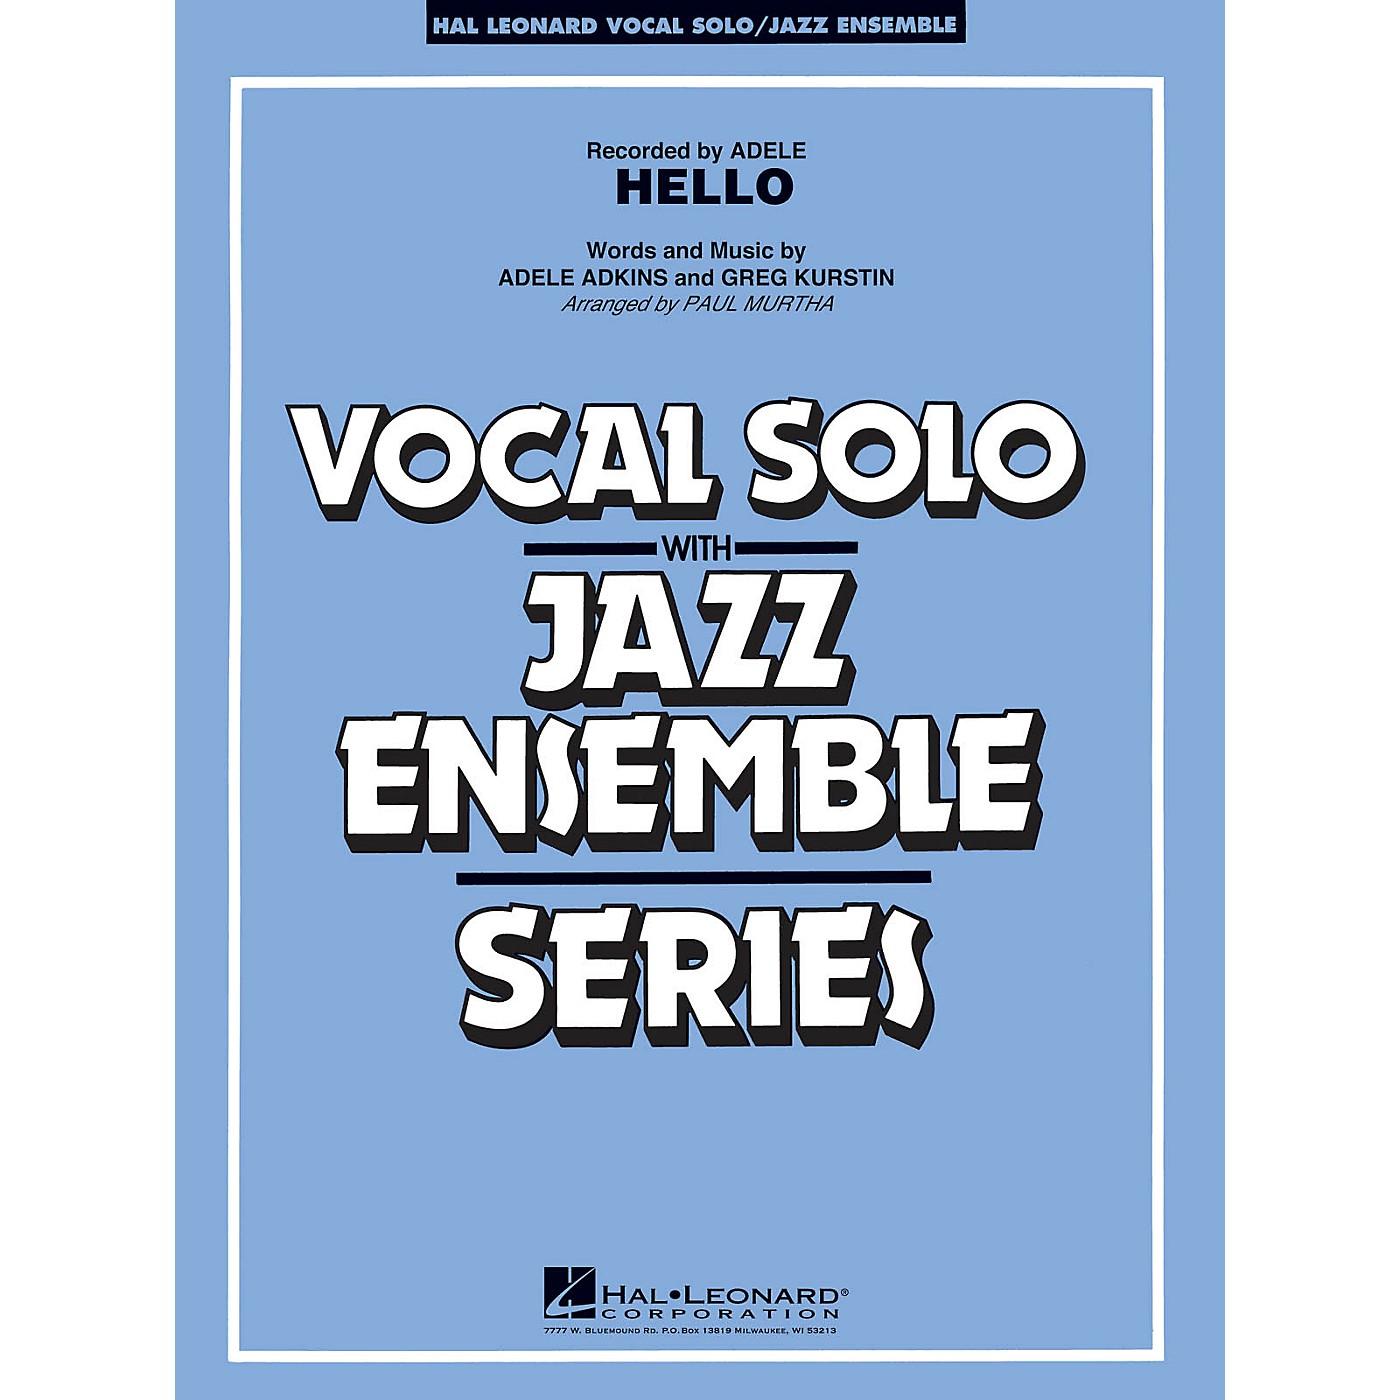 Hal Leonard Hello (Key: Fmi) Jazz Band Level 3-4 Composed by Greg Kurstin thumbnail